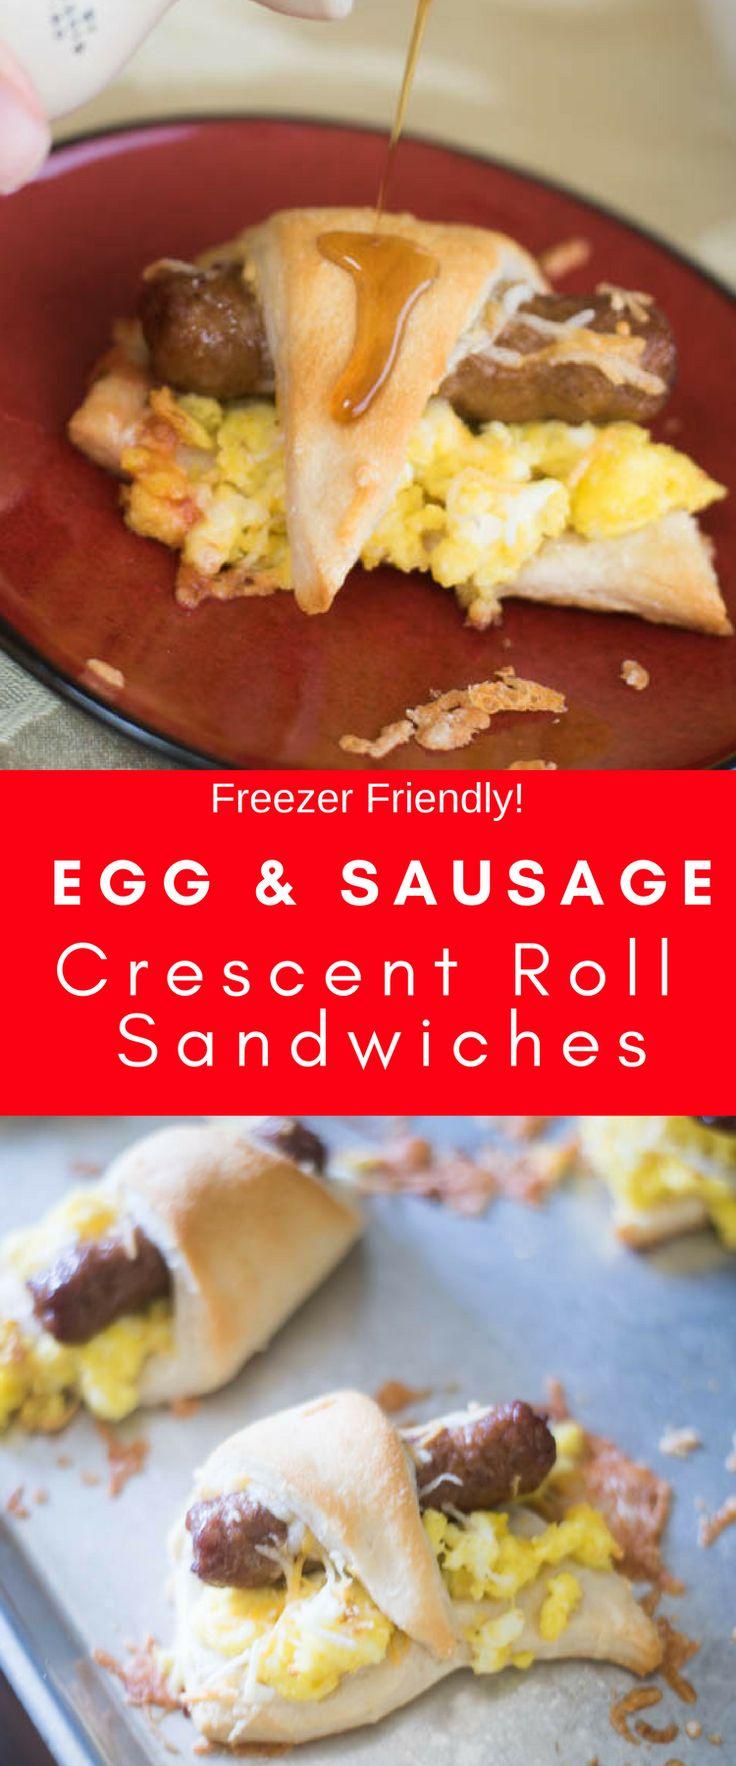 Sausage Breakfast Sandwich / Crescent Roll Recipes / Freezer Breakfast / Freezer Meals / Back to School / Breakfast / Easy Breakfast / #breakfast #sausage #backtoschool #easyrecipe #ad